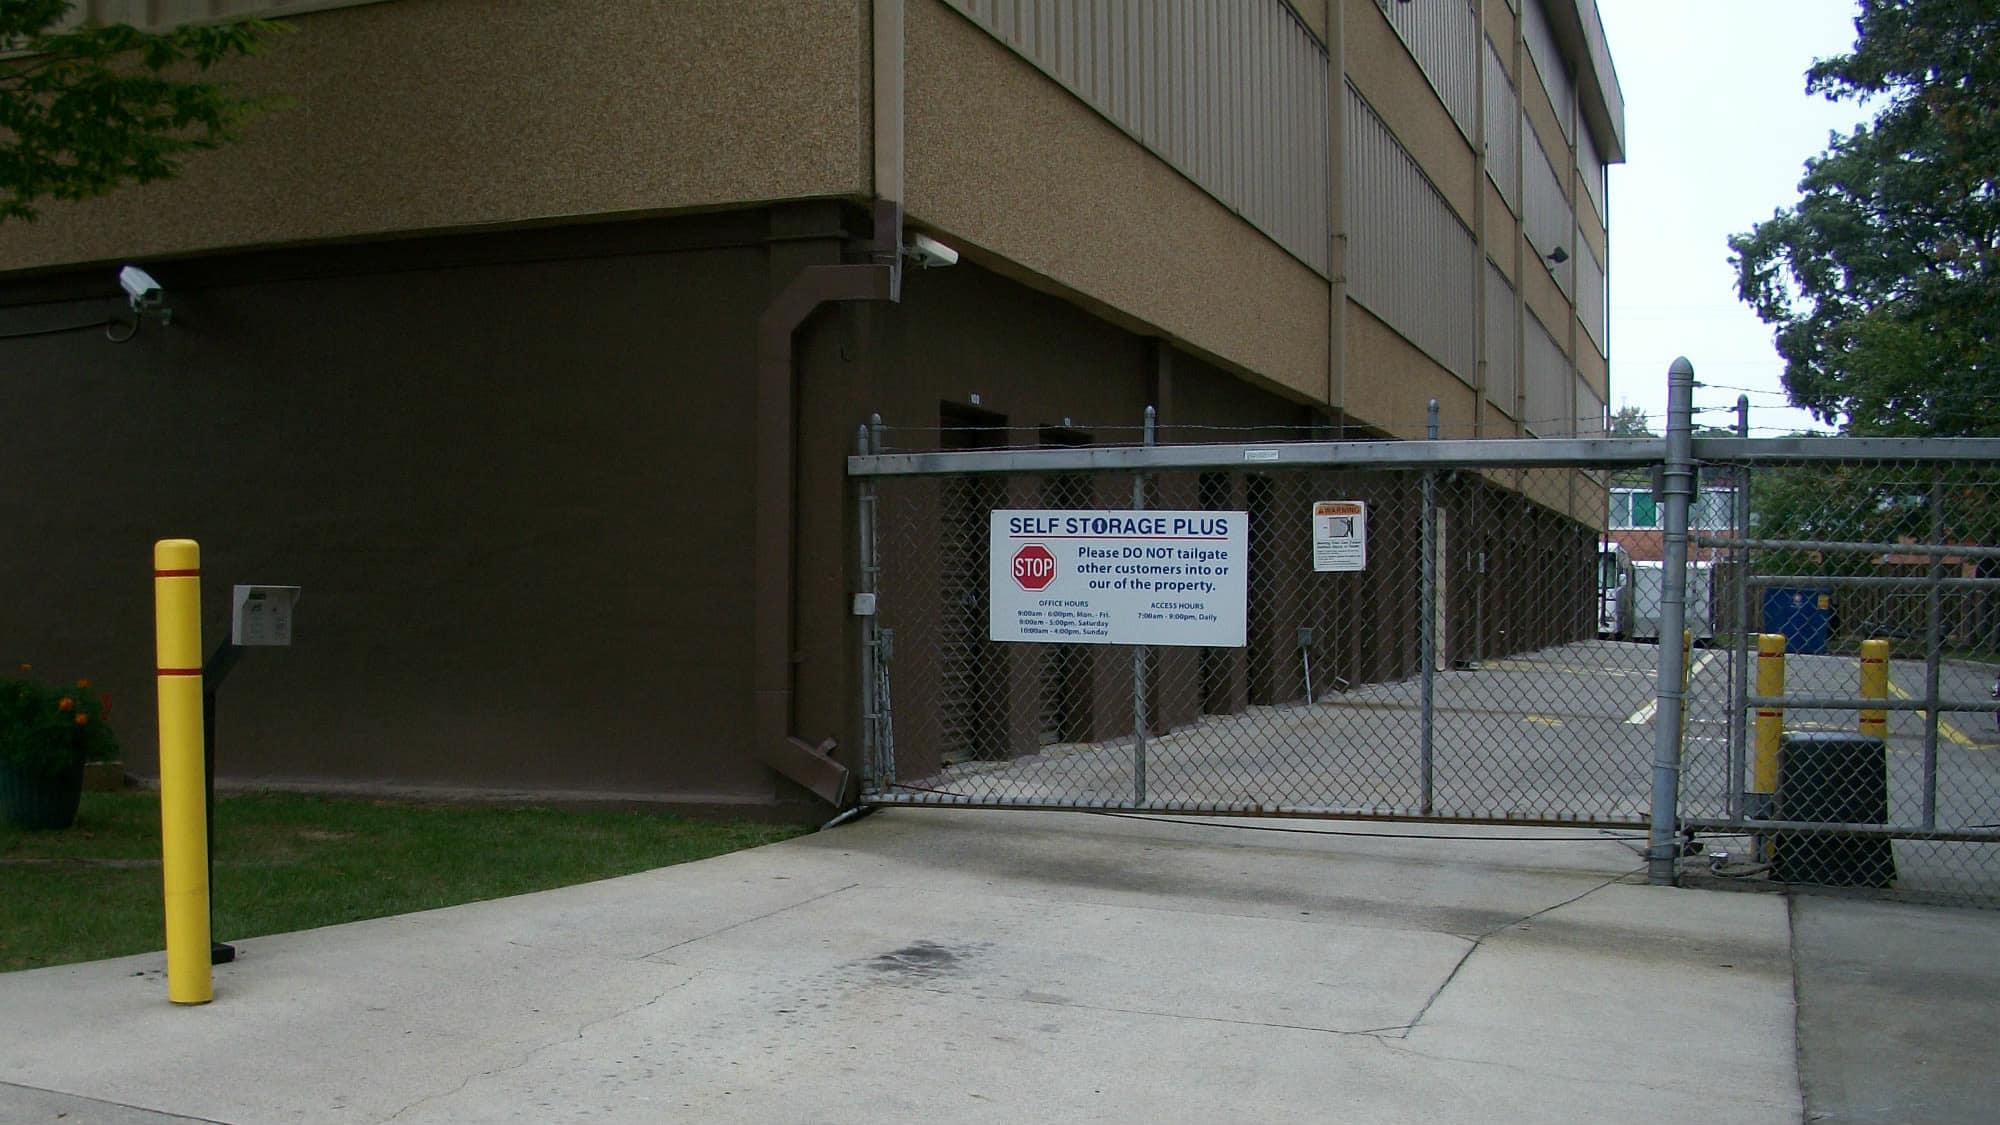 Entrance gate at Self Storage Plus in Lanham, MD